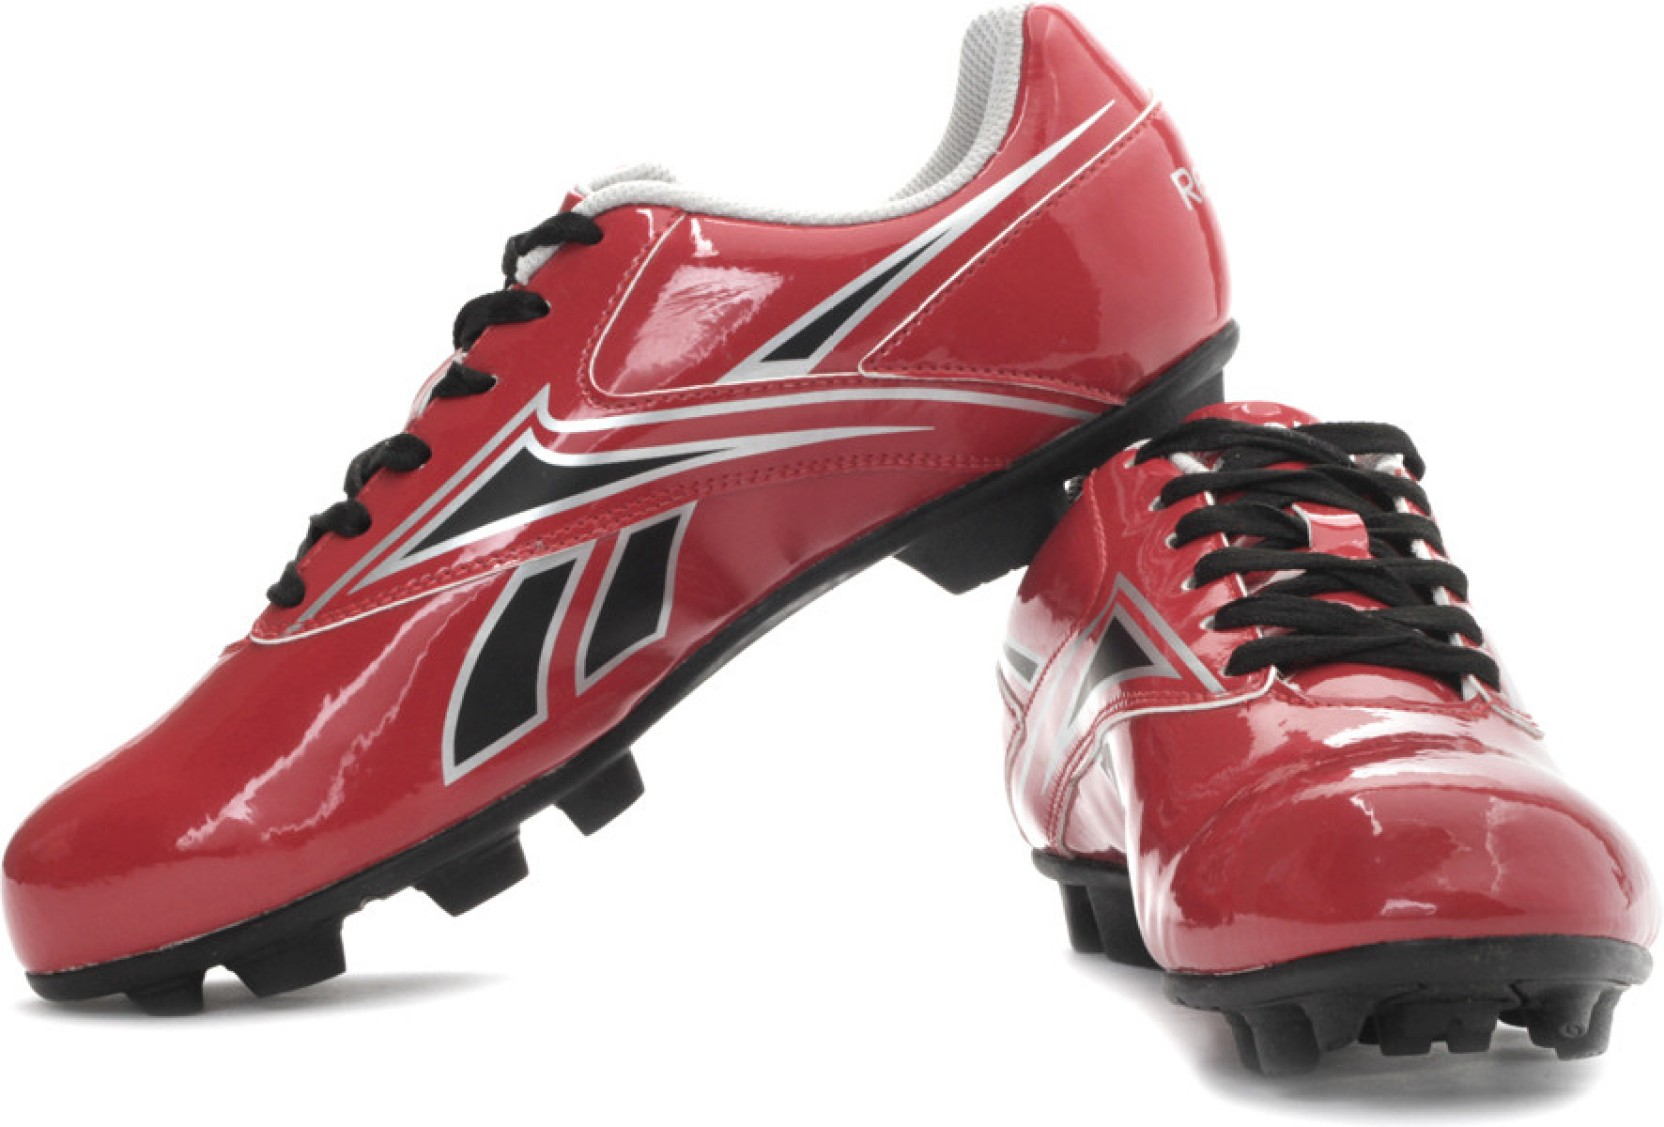 reebok football shoes price 28 images reebok nfl